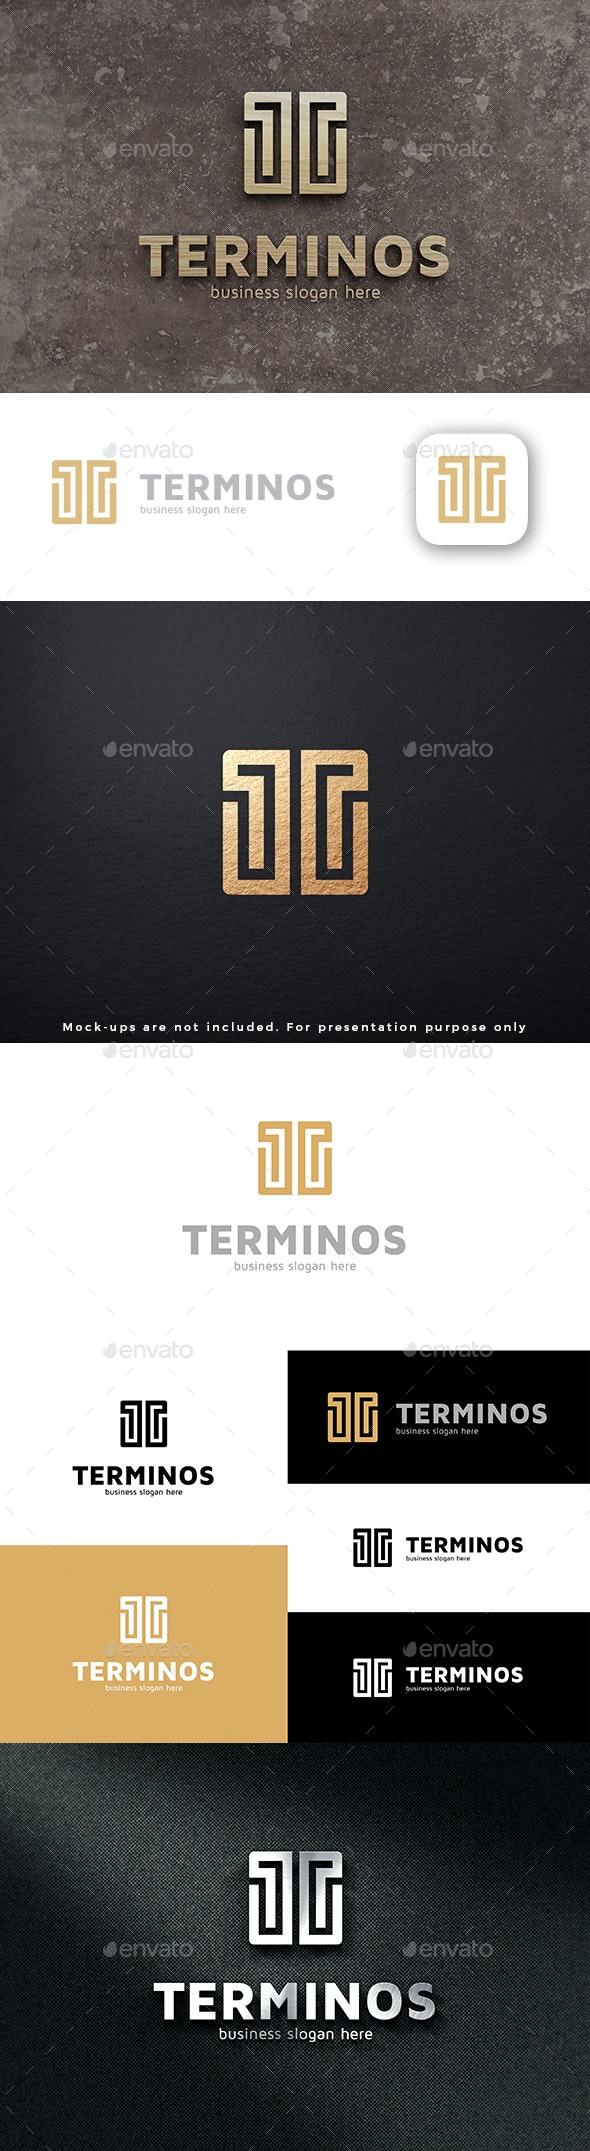 Letter T Logo - Terminos - Letters Logo Templates